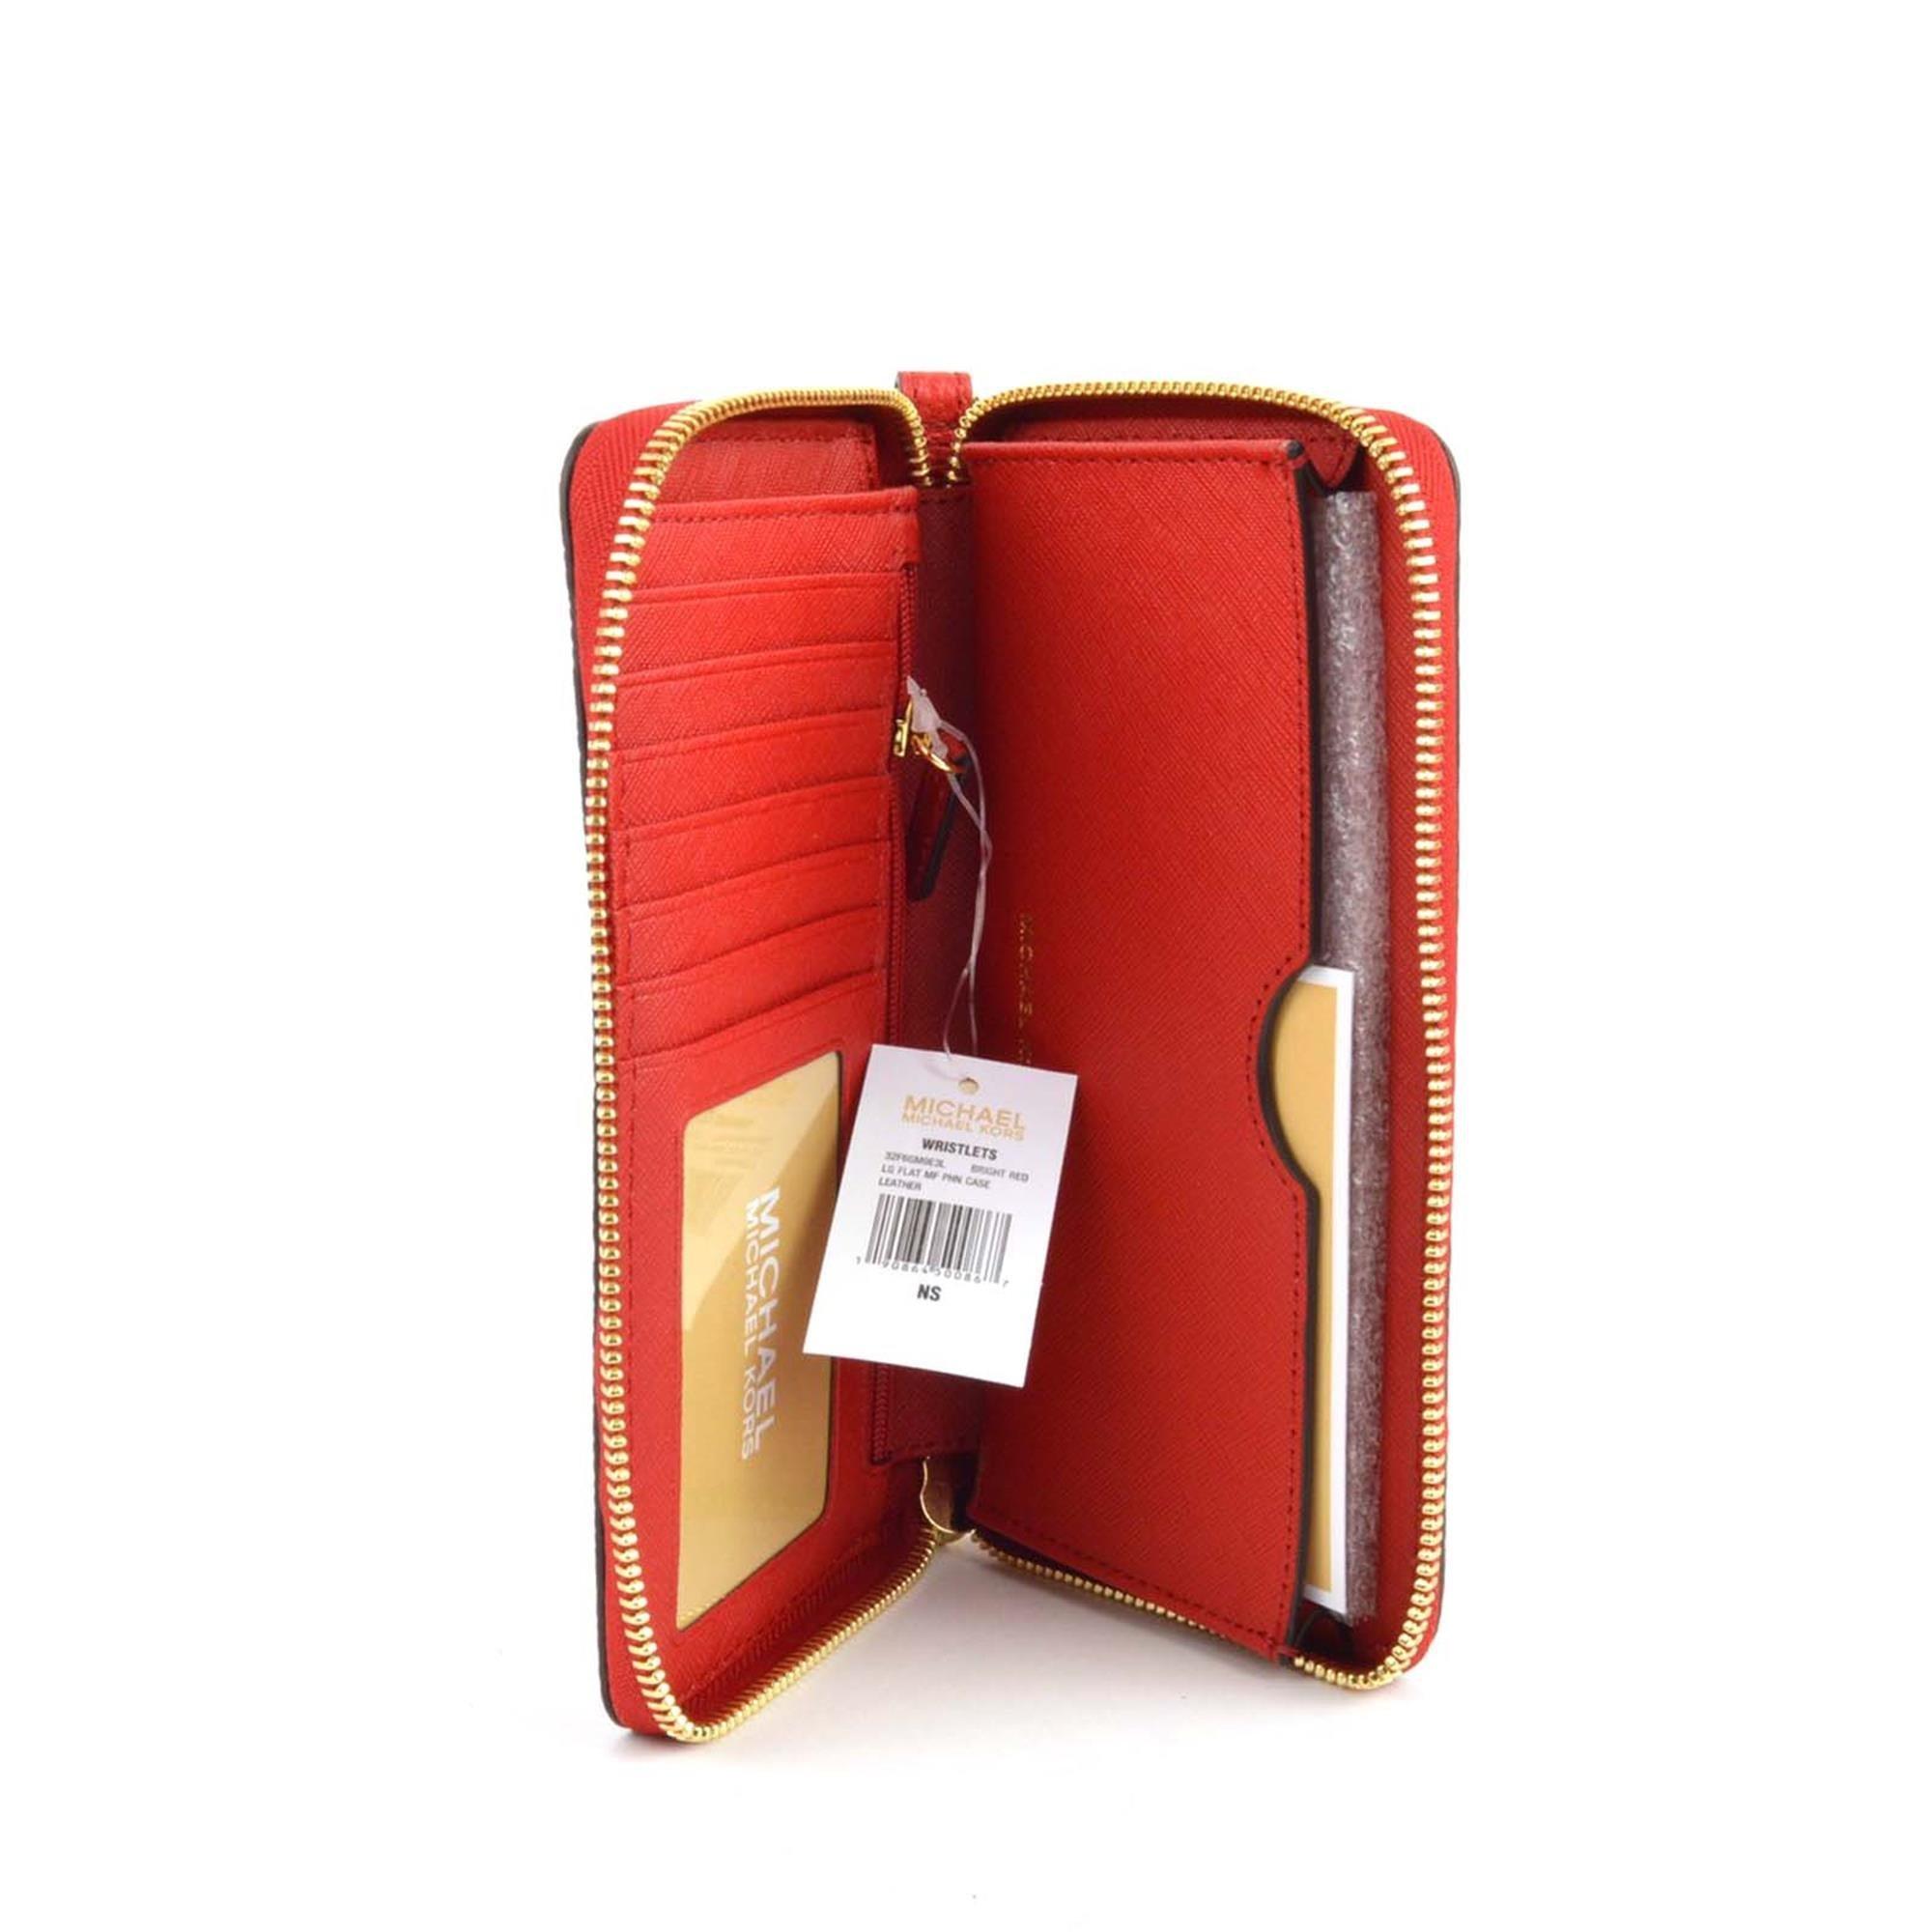 Michael Kors Giftables Jet Set Travel Flat Leather Phone Case (Tangerine Orange)